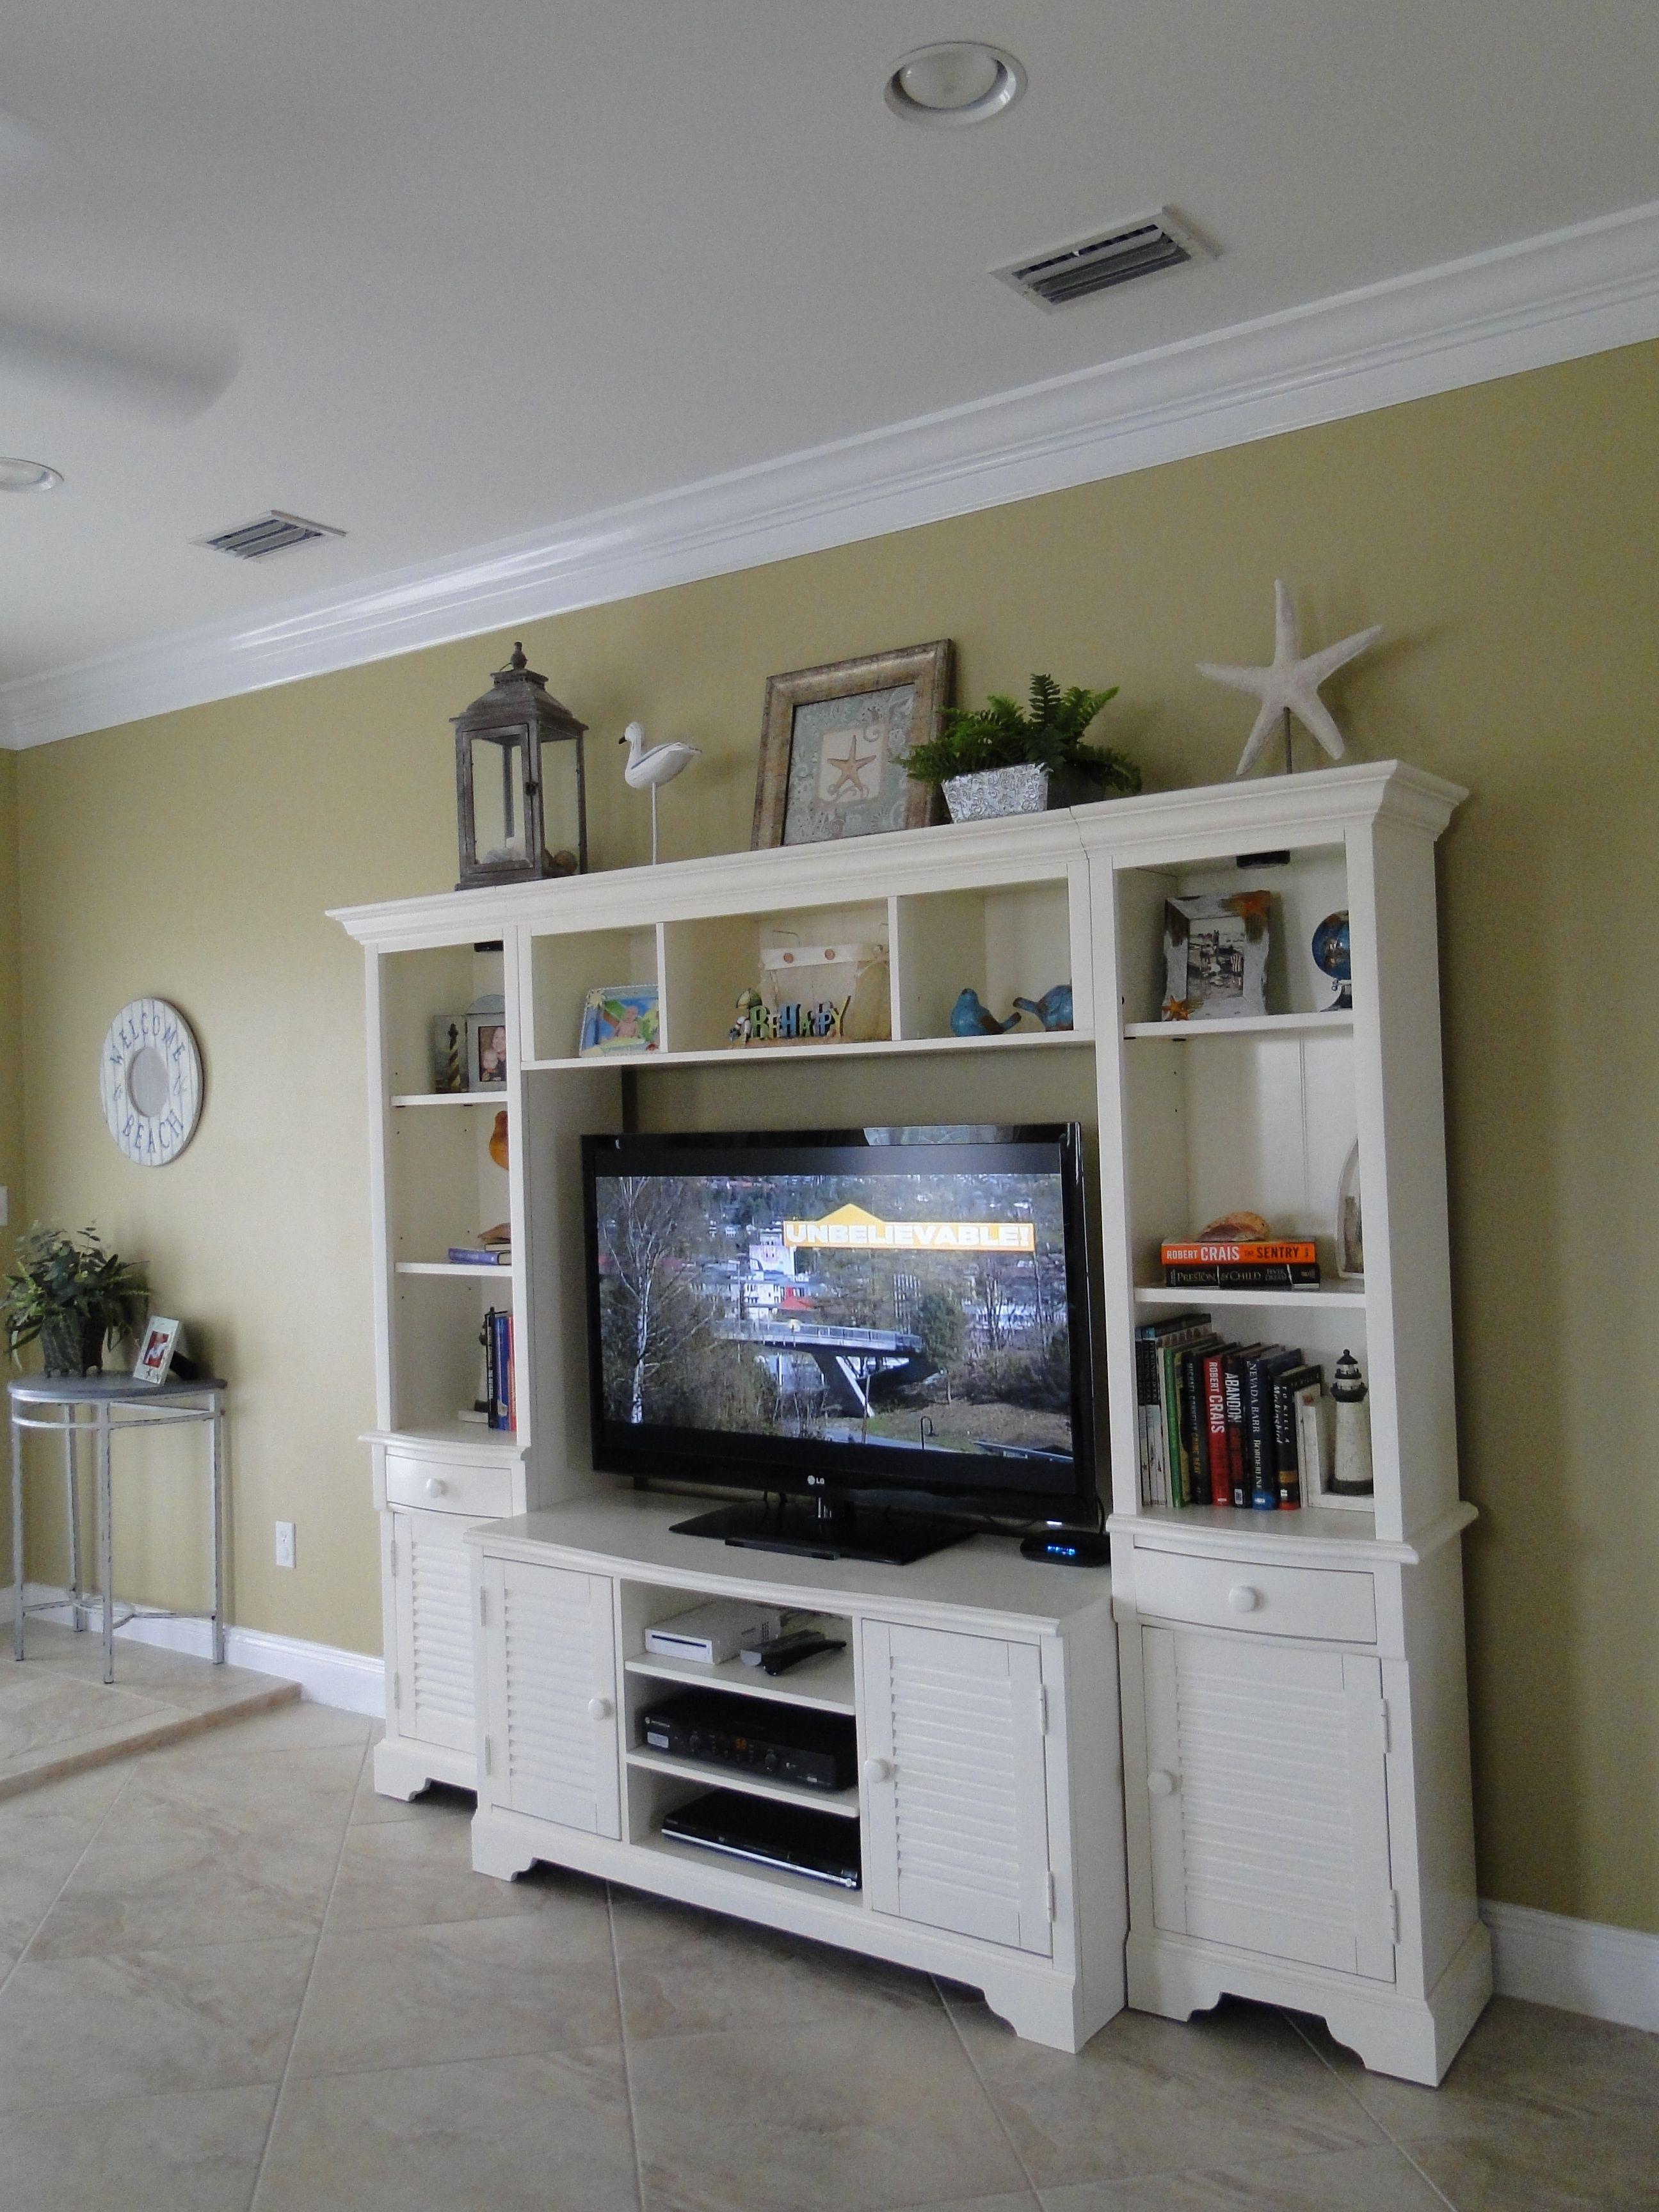 decor for entertainment center beach house pinterest. Black Bedroom Furniture Sets. Home Design Ideas